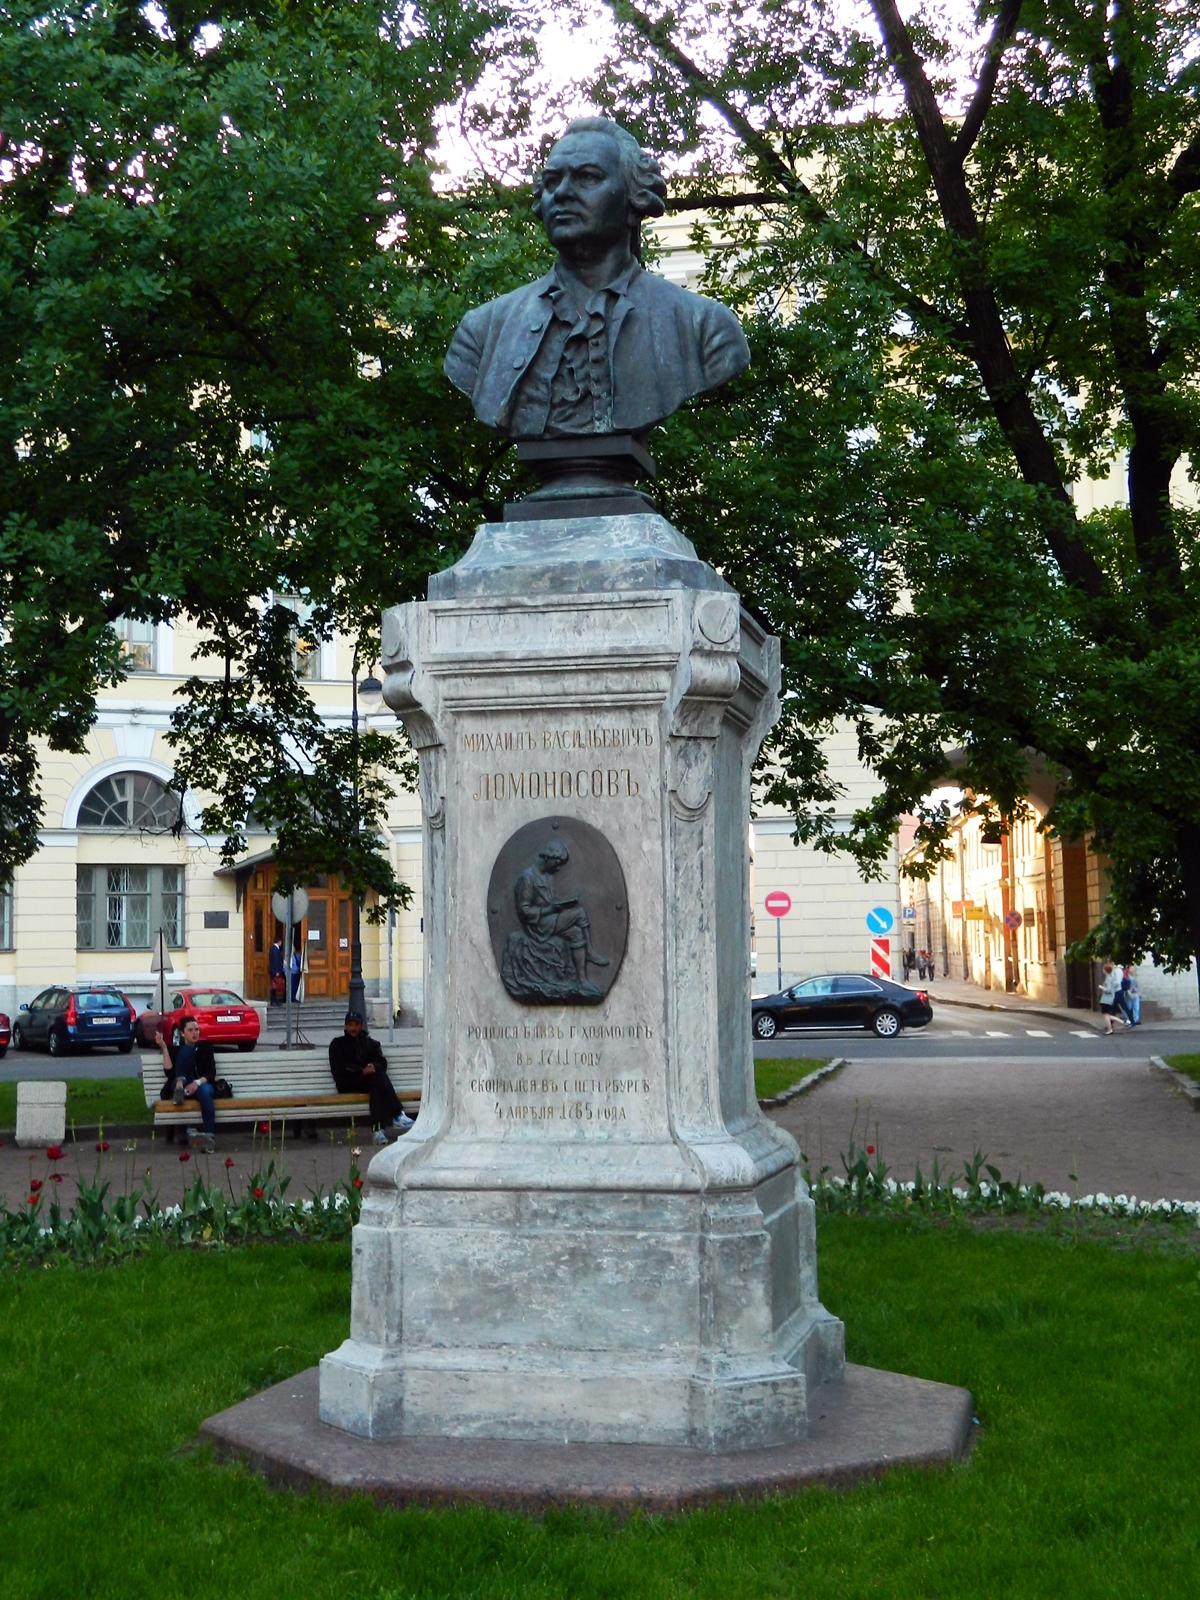 Памятник М. В. Ломоносову (Санкт-Петербург, площадь Ломоносова). Фото: Тара-Амингу at Russian Wikipedia